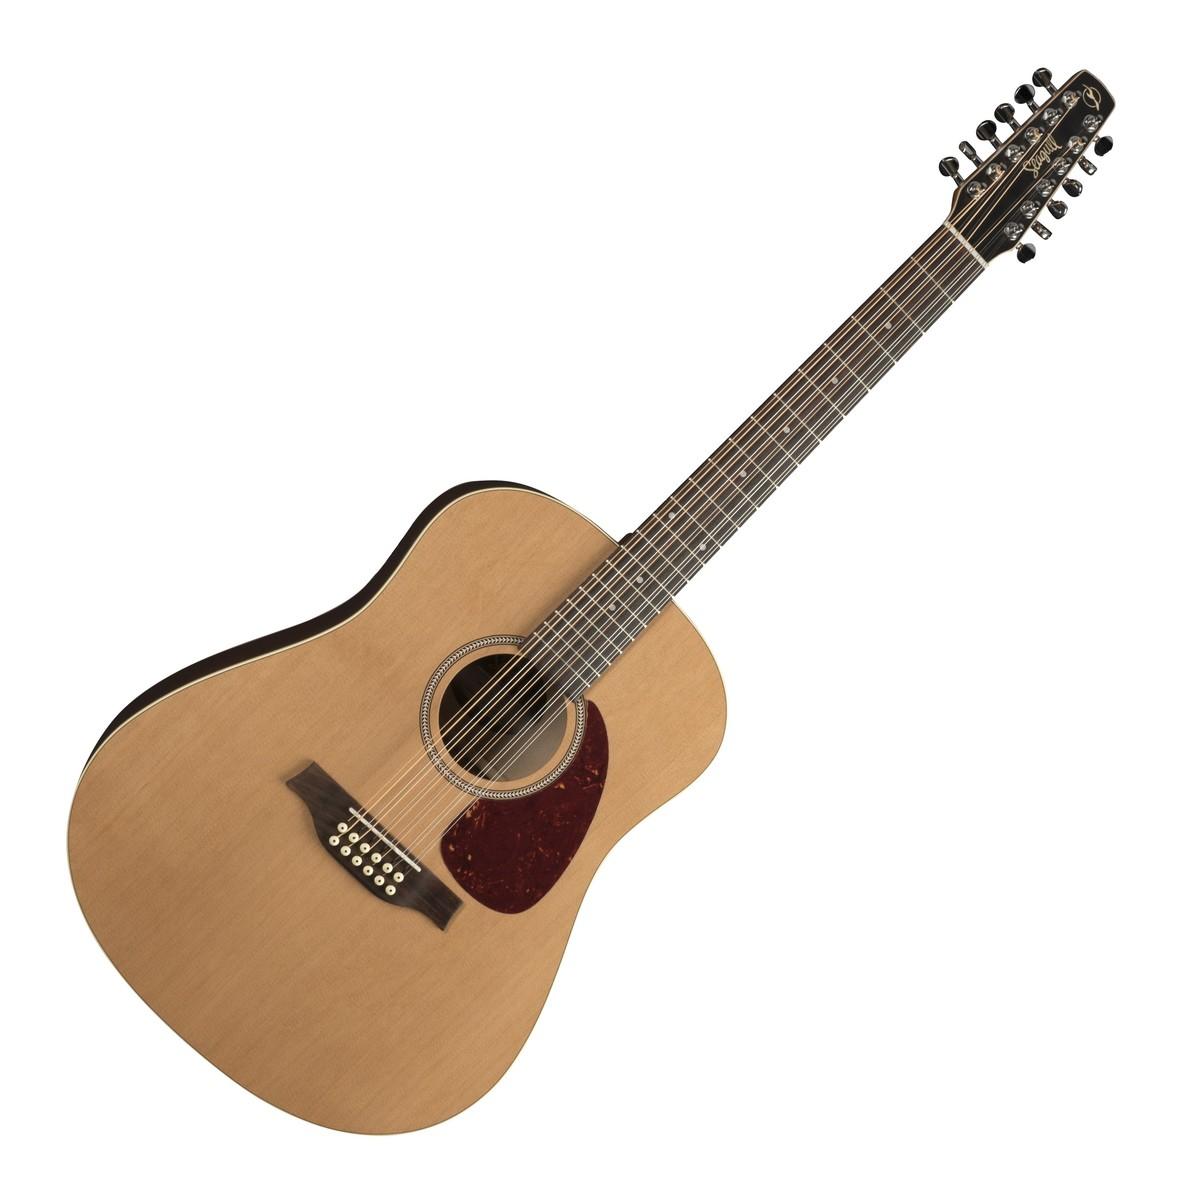 seagull coastline s12 cedar 12 string acoustic guitar at gear4music. Black Bedroom Furniture Sets. Home Design Ideas